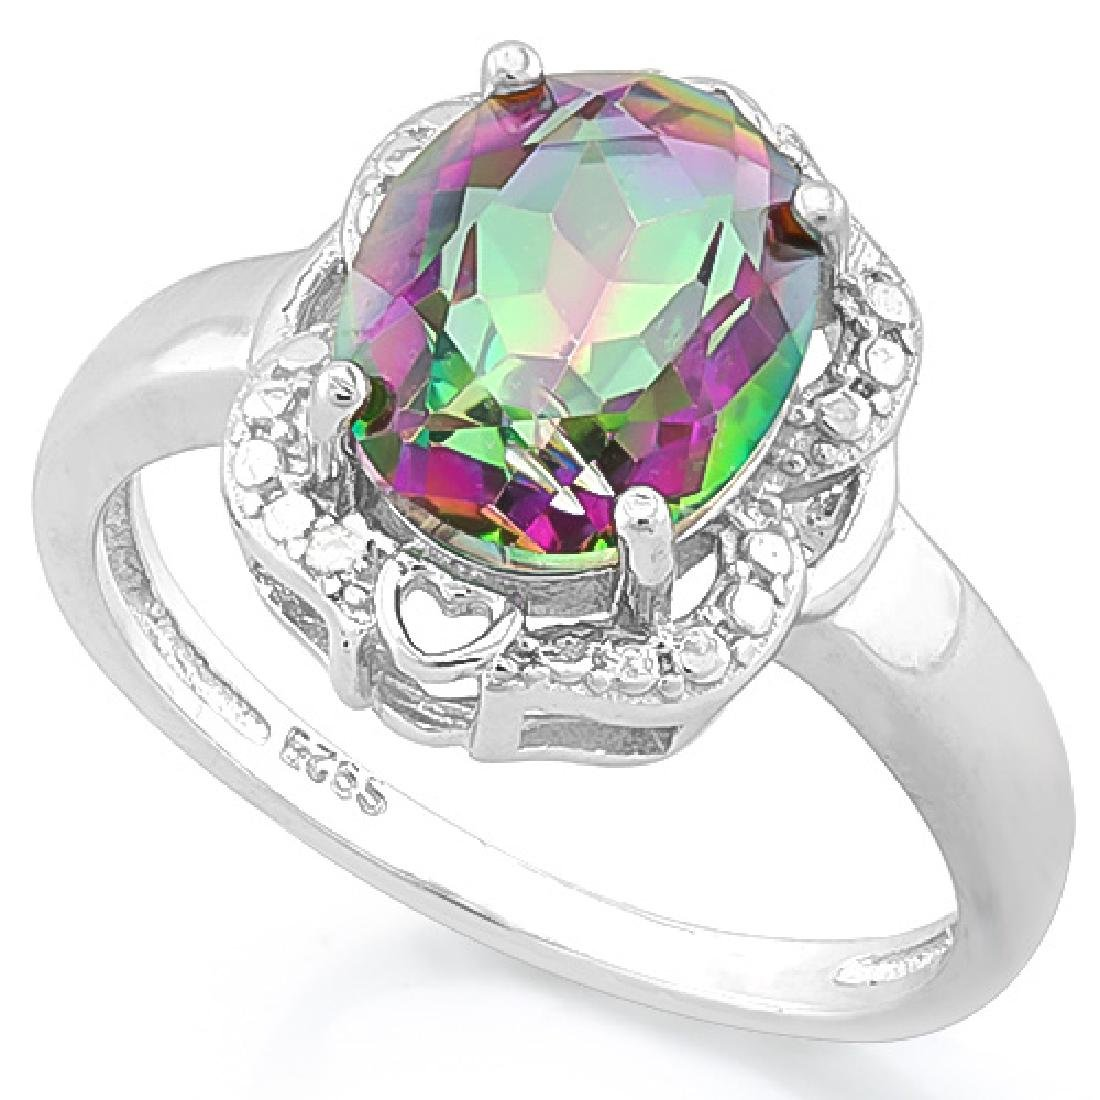 2 3/5 CARAT MYSTIC GEMSTONE & DIAMOND 925 STERLING SILV